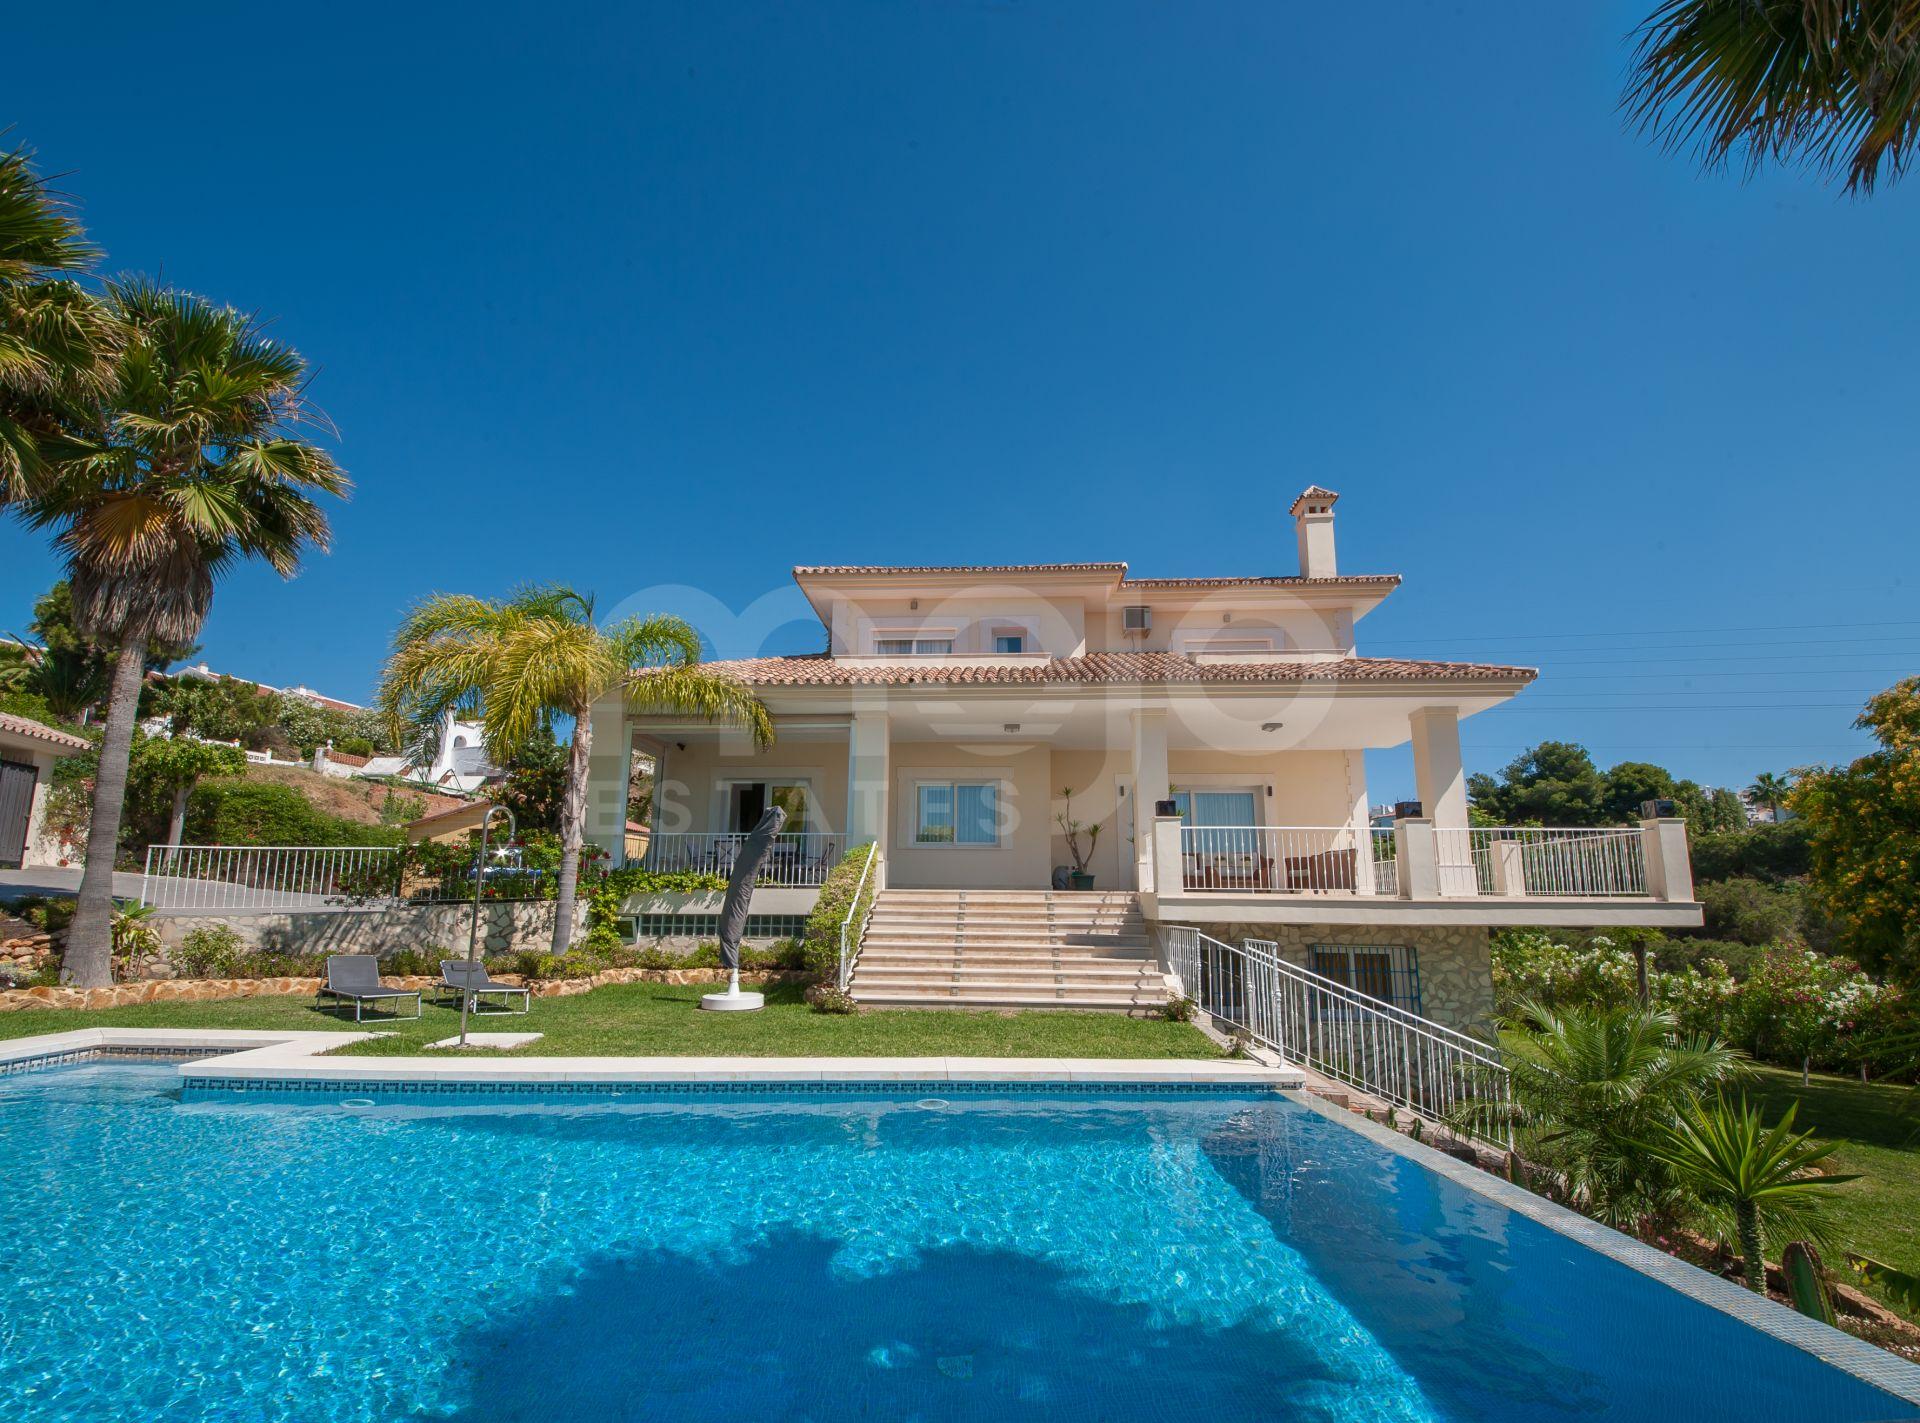 Villa til salg i Calahonda, Mijas Costa